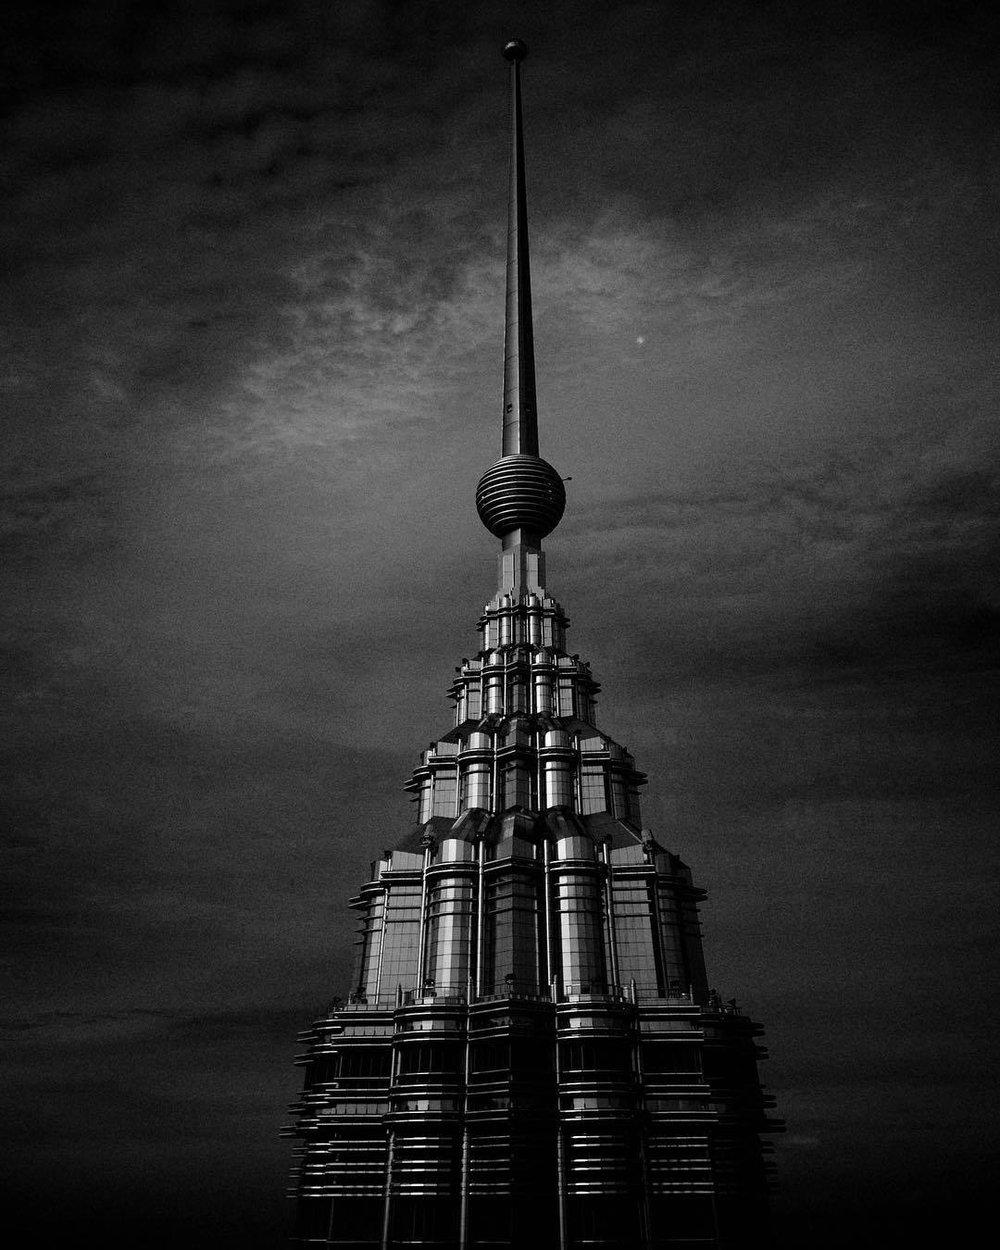 Architecture. Petronas tower. #blackandwhite #architecture #architecturephotography #blackandwhitephoto #petronas #petronastower #cloudysky #malasyia #asia #southasia #asean #bulding #postmodernism #micro43rds #microfourthirds #olympus #olympuspen #penf #lumixlens  (at PETRONAS Twin Towers)